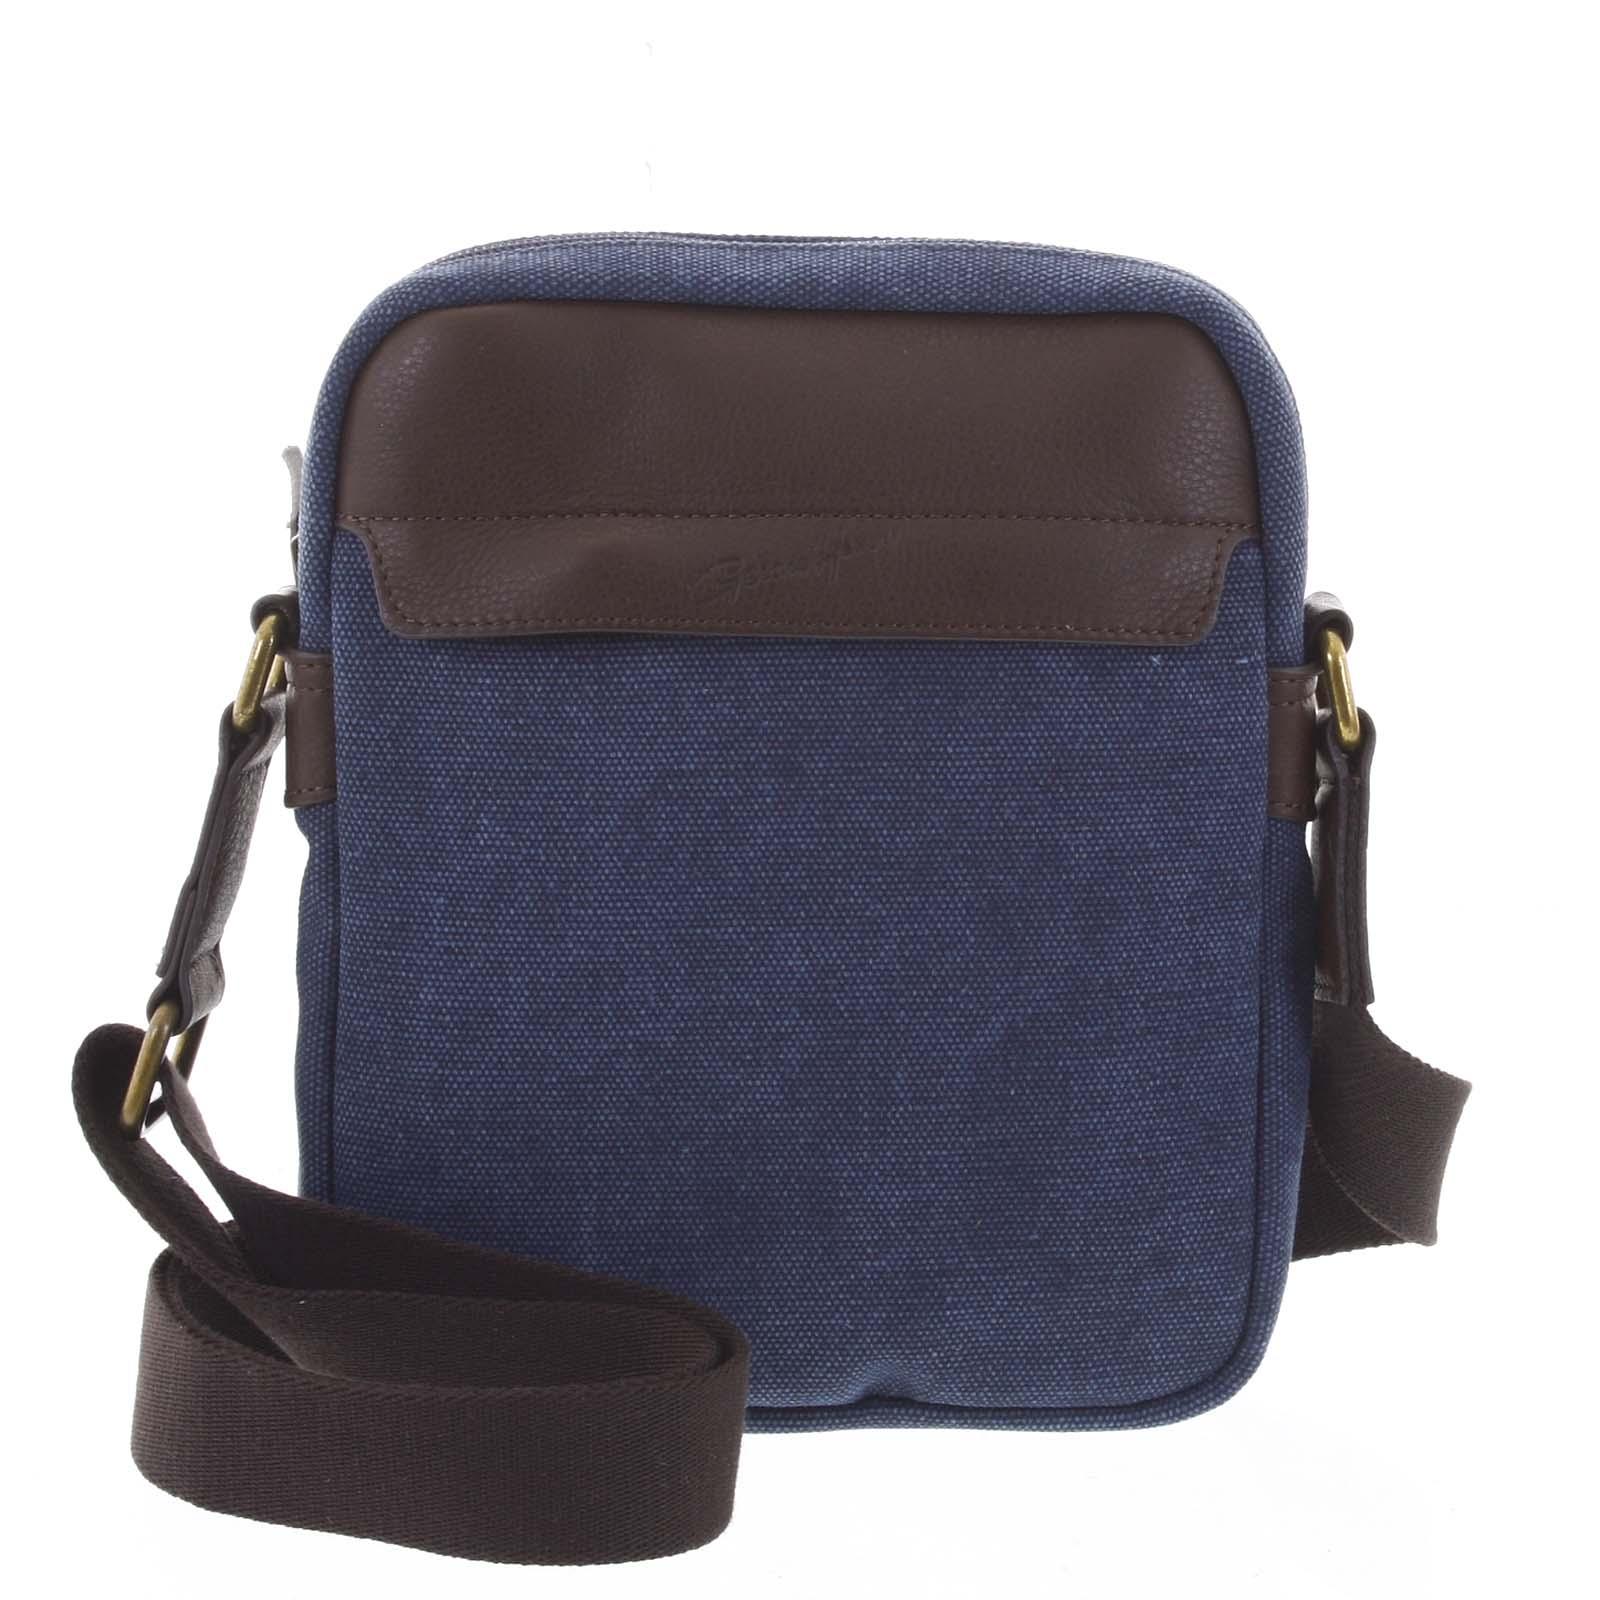 Stylová pánská taška na doklady modrá - Gerard Henon Vidal